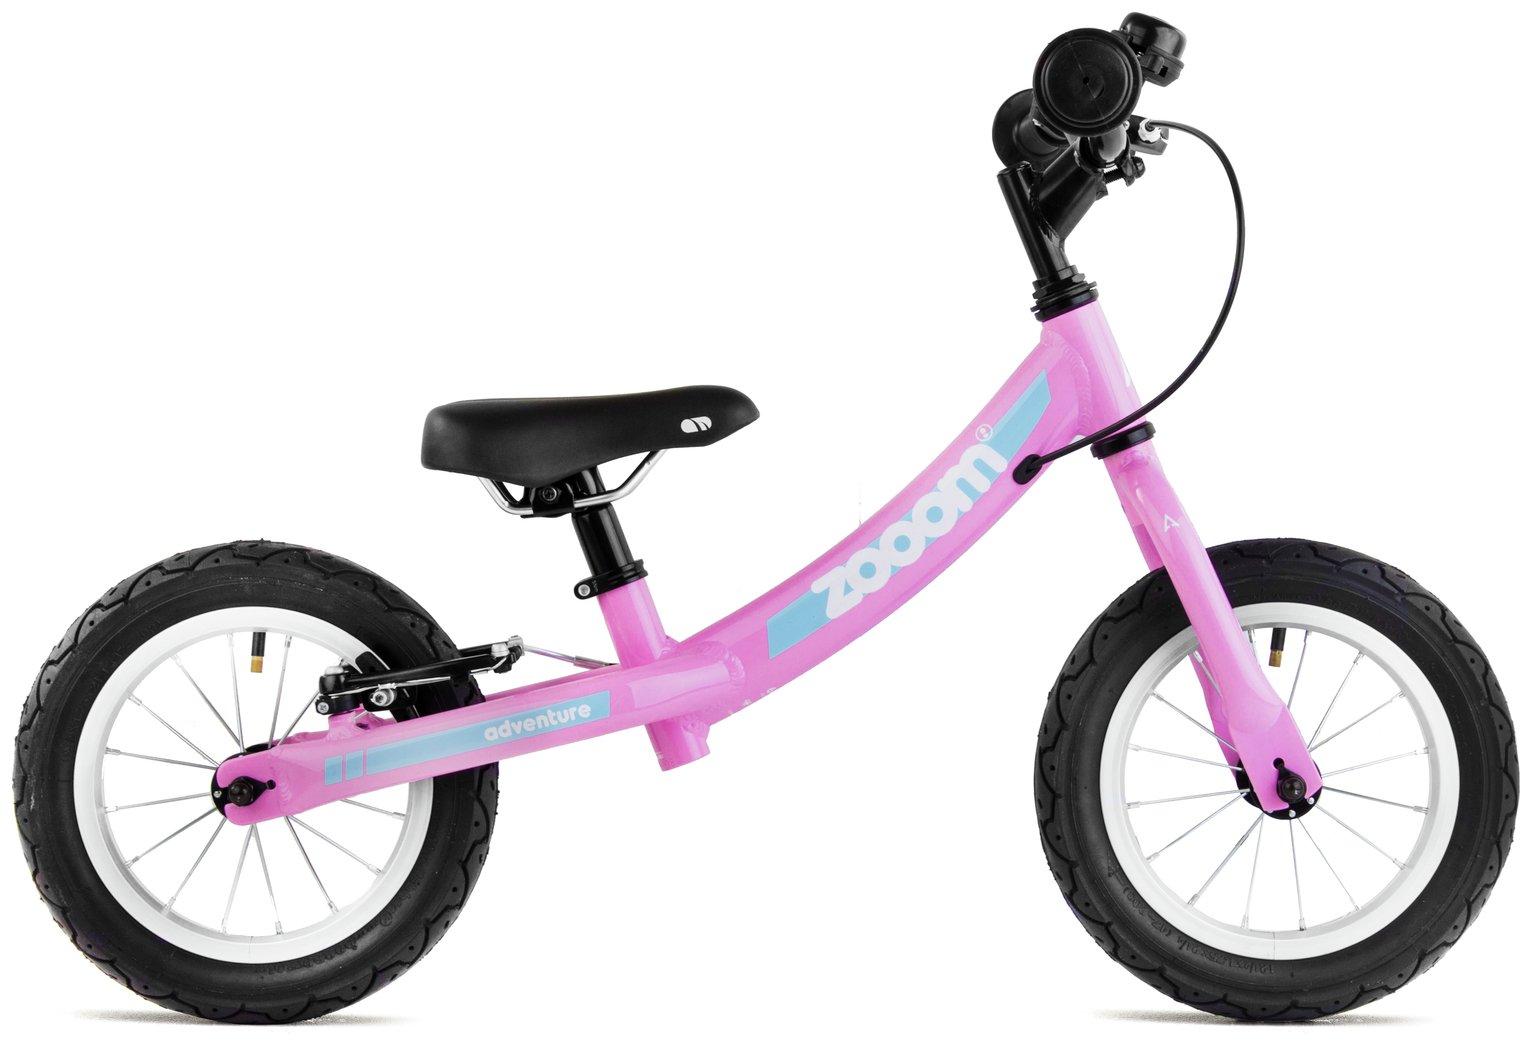 Image of Adventure Zooom Balance Bike - Pink.